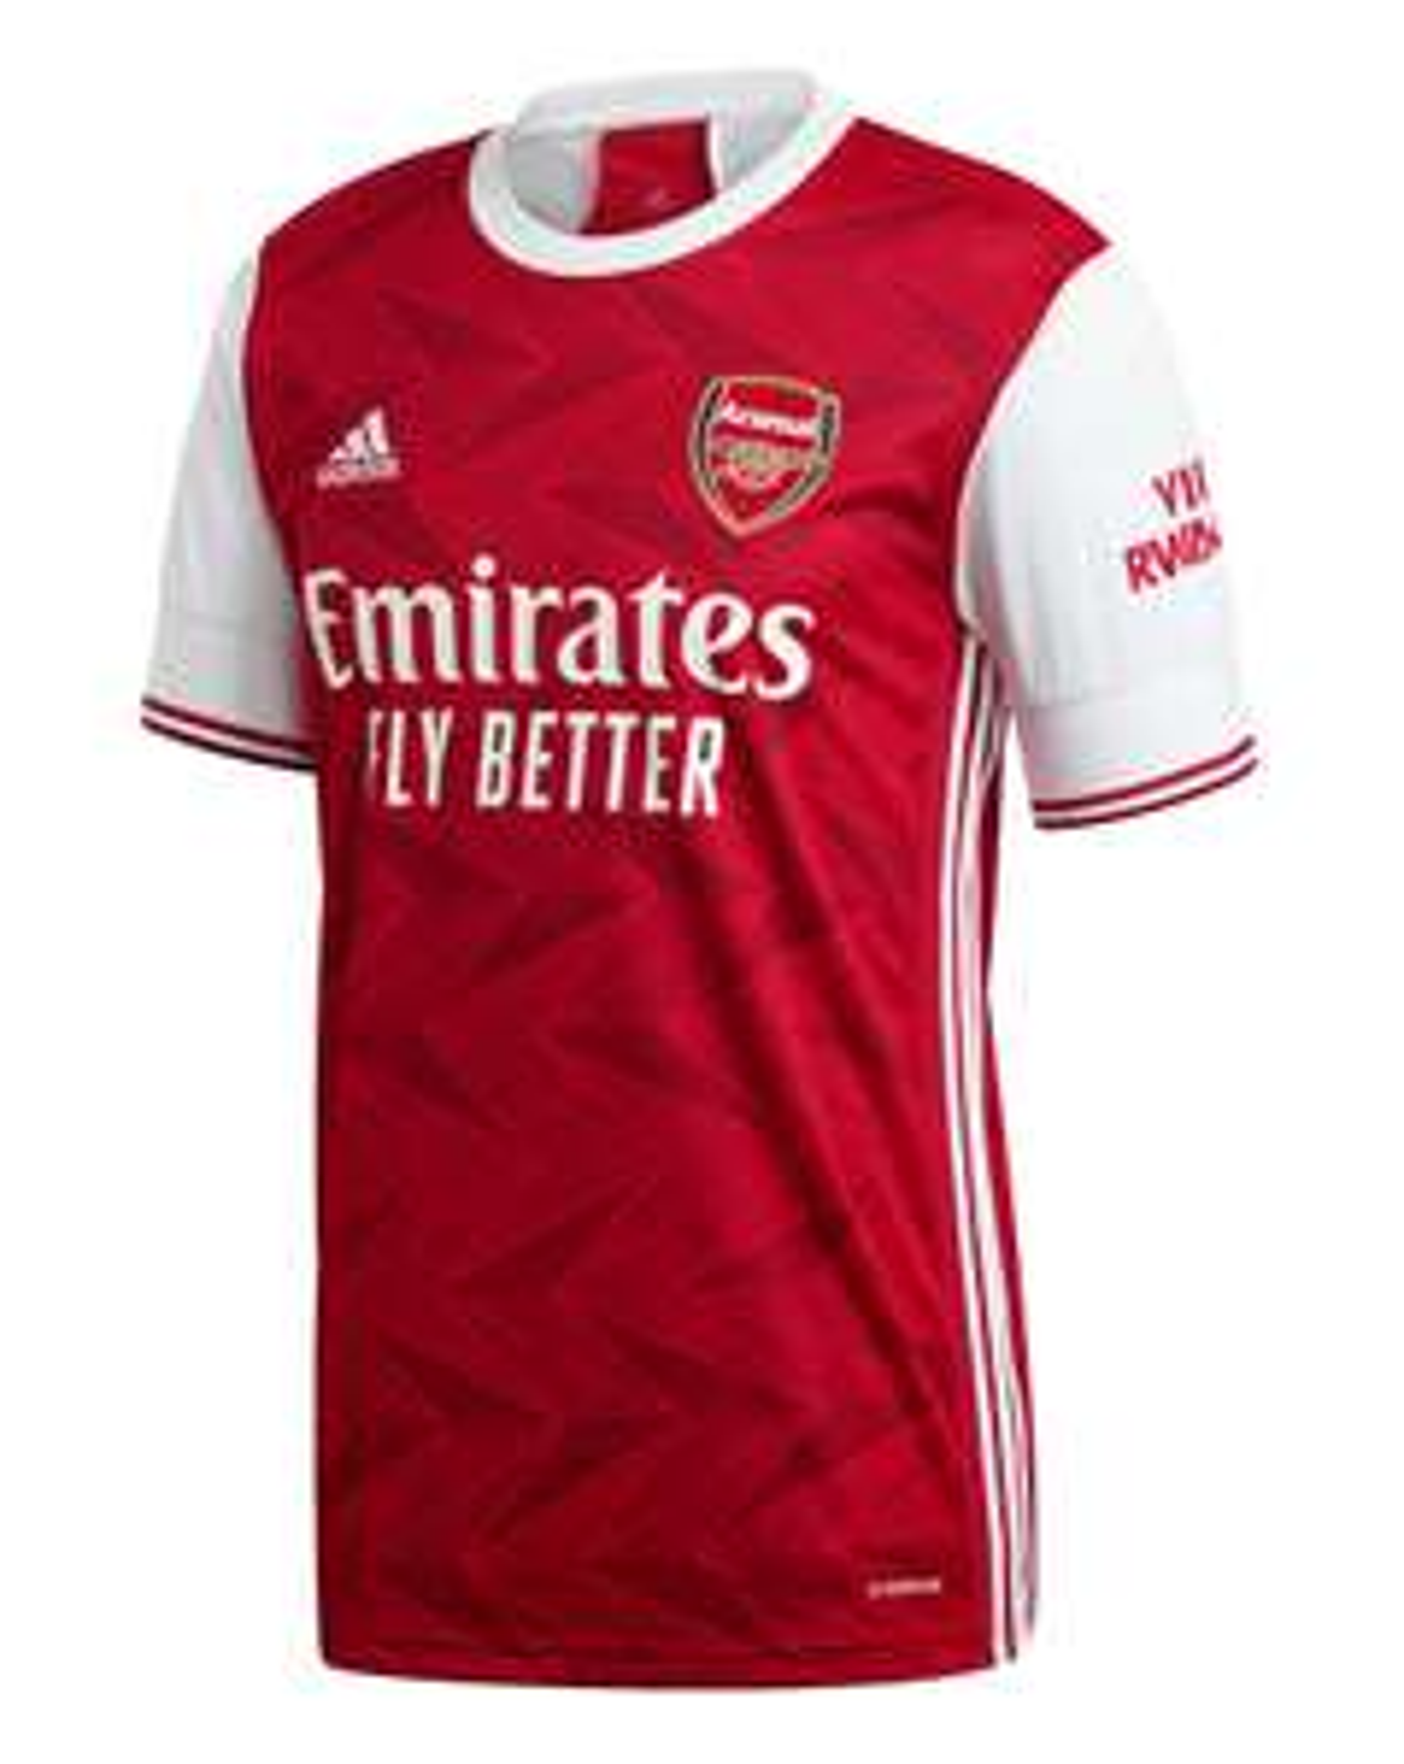 adidas Arsenal FC 2020/21 Short Sleeve Home Shirt - £48.75 @ Jacamo